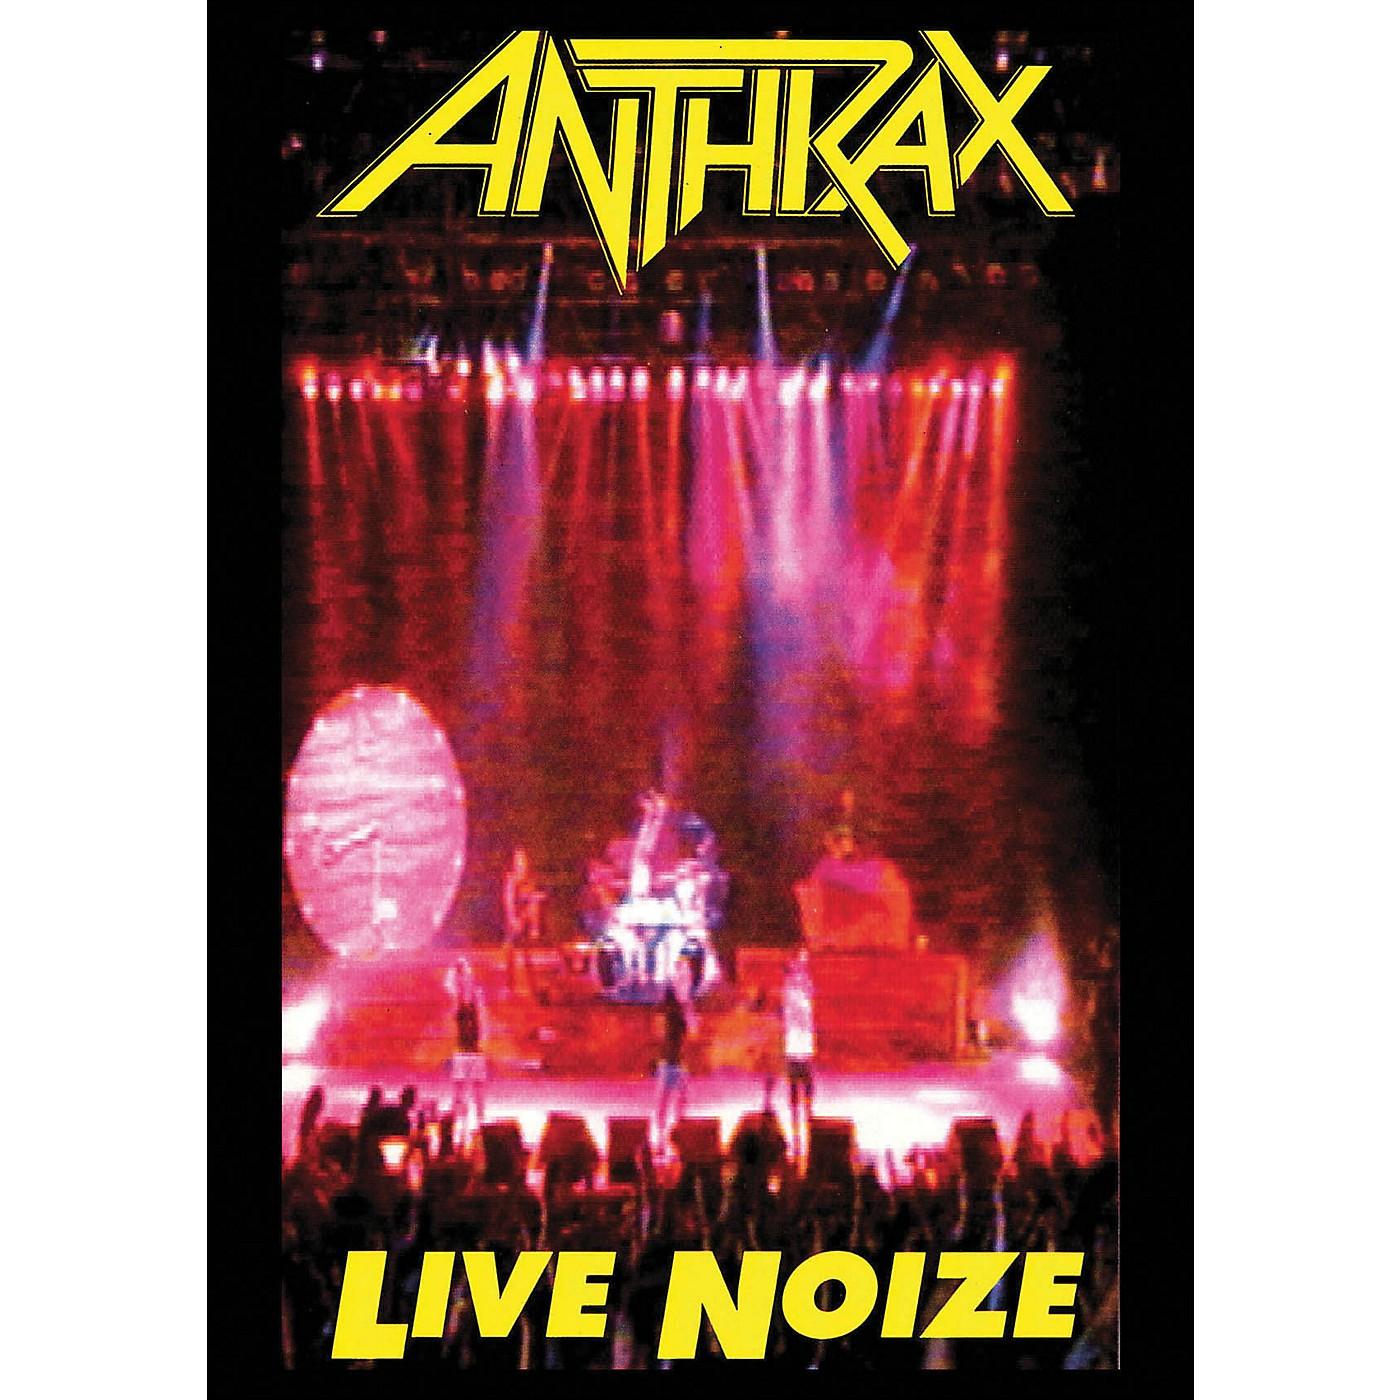 Hal Leonard Anthrax Live Noize DVD 1991 Concert with Public Enemy DVD thumbnail